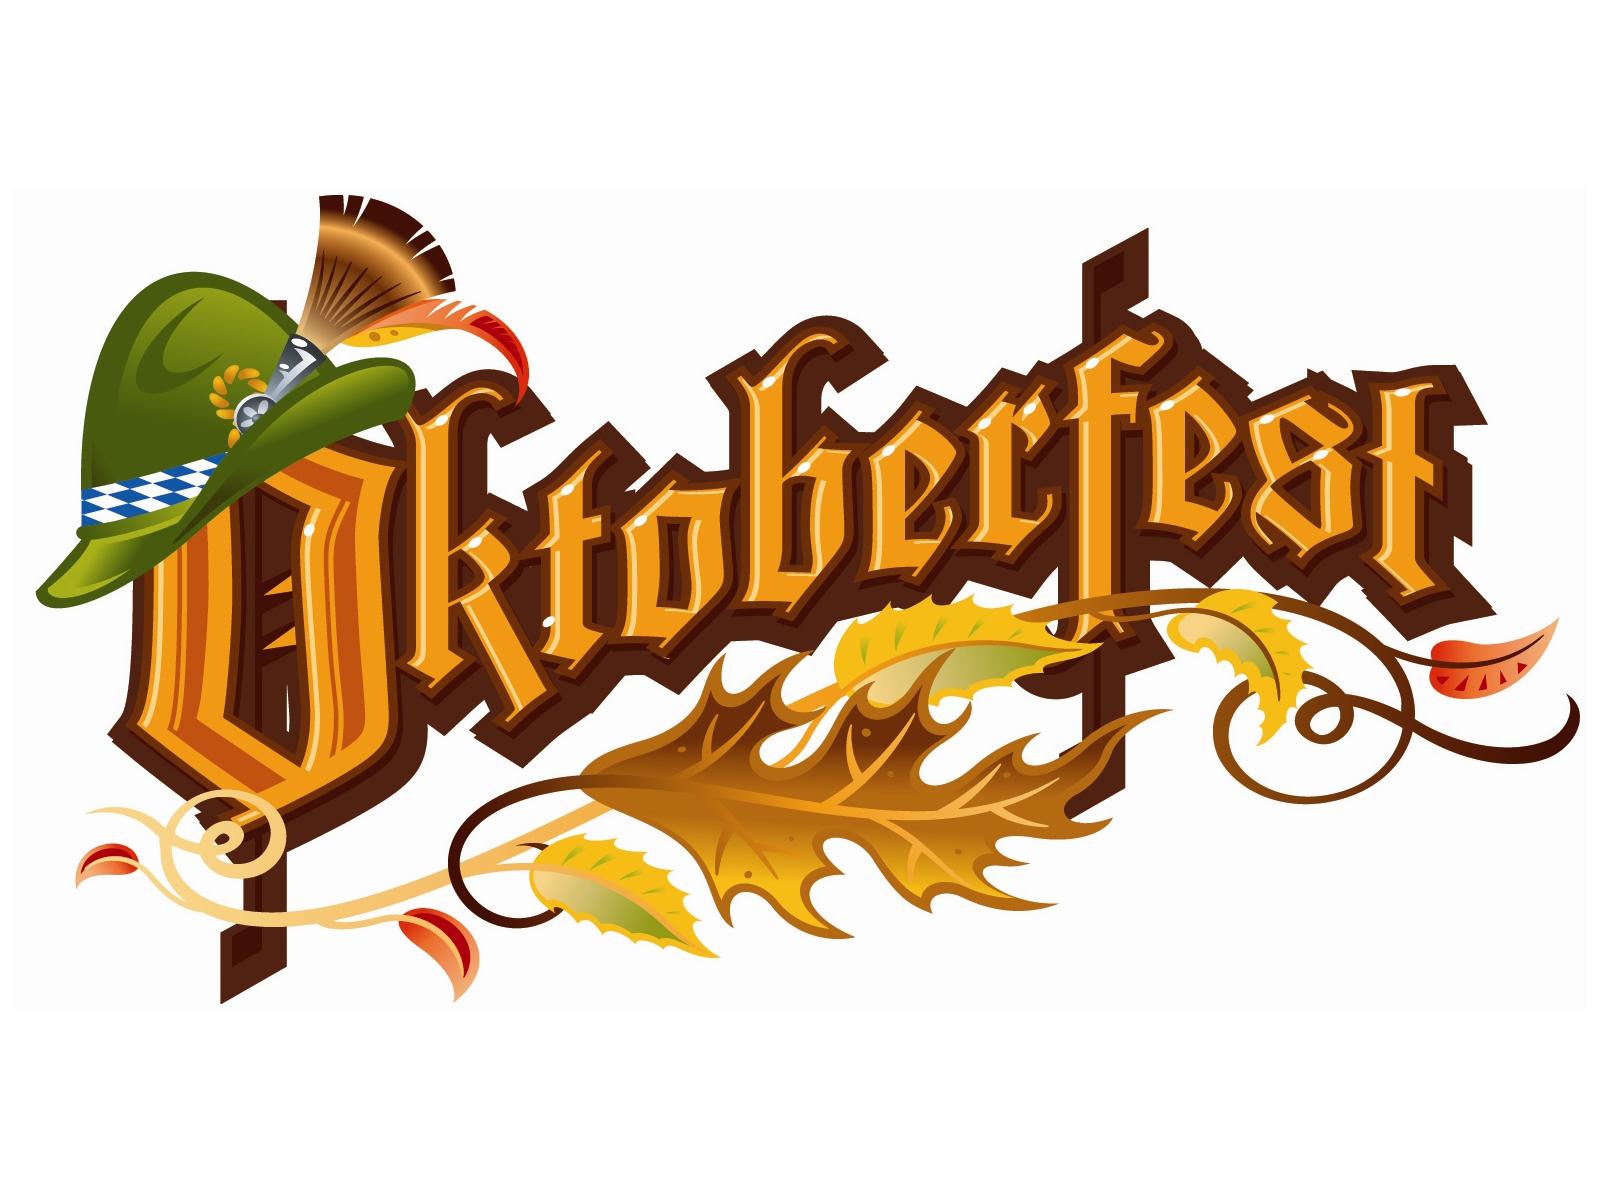 октоберфест фестиваль